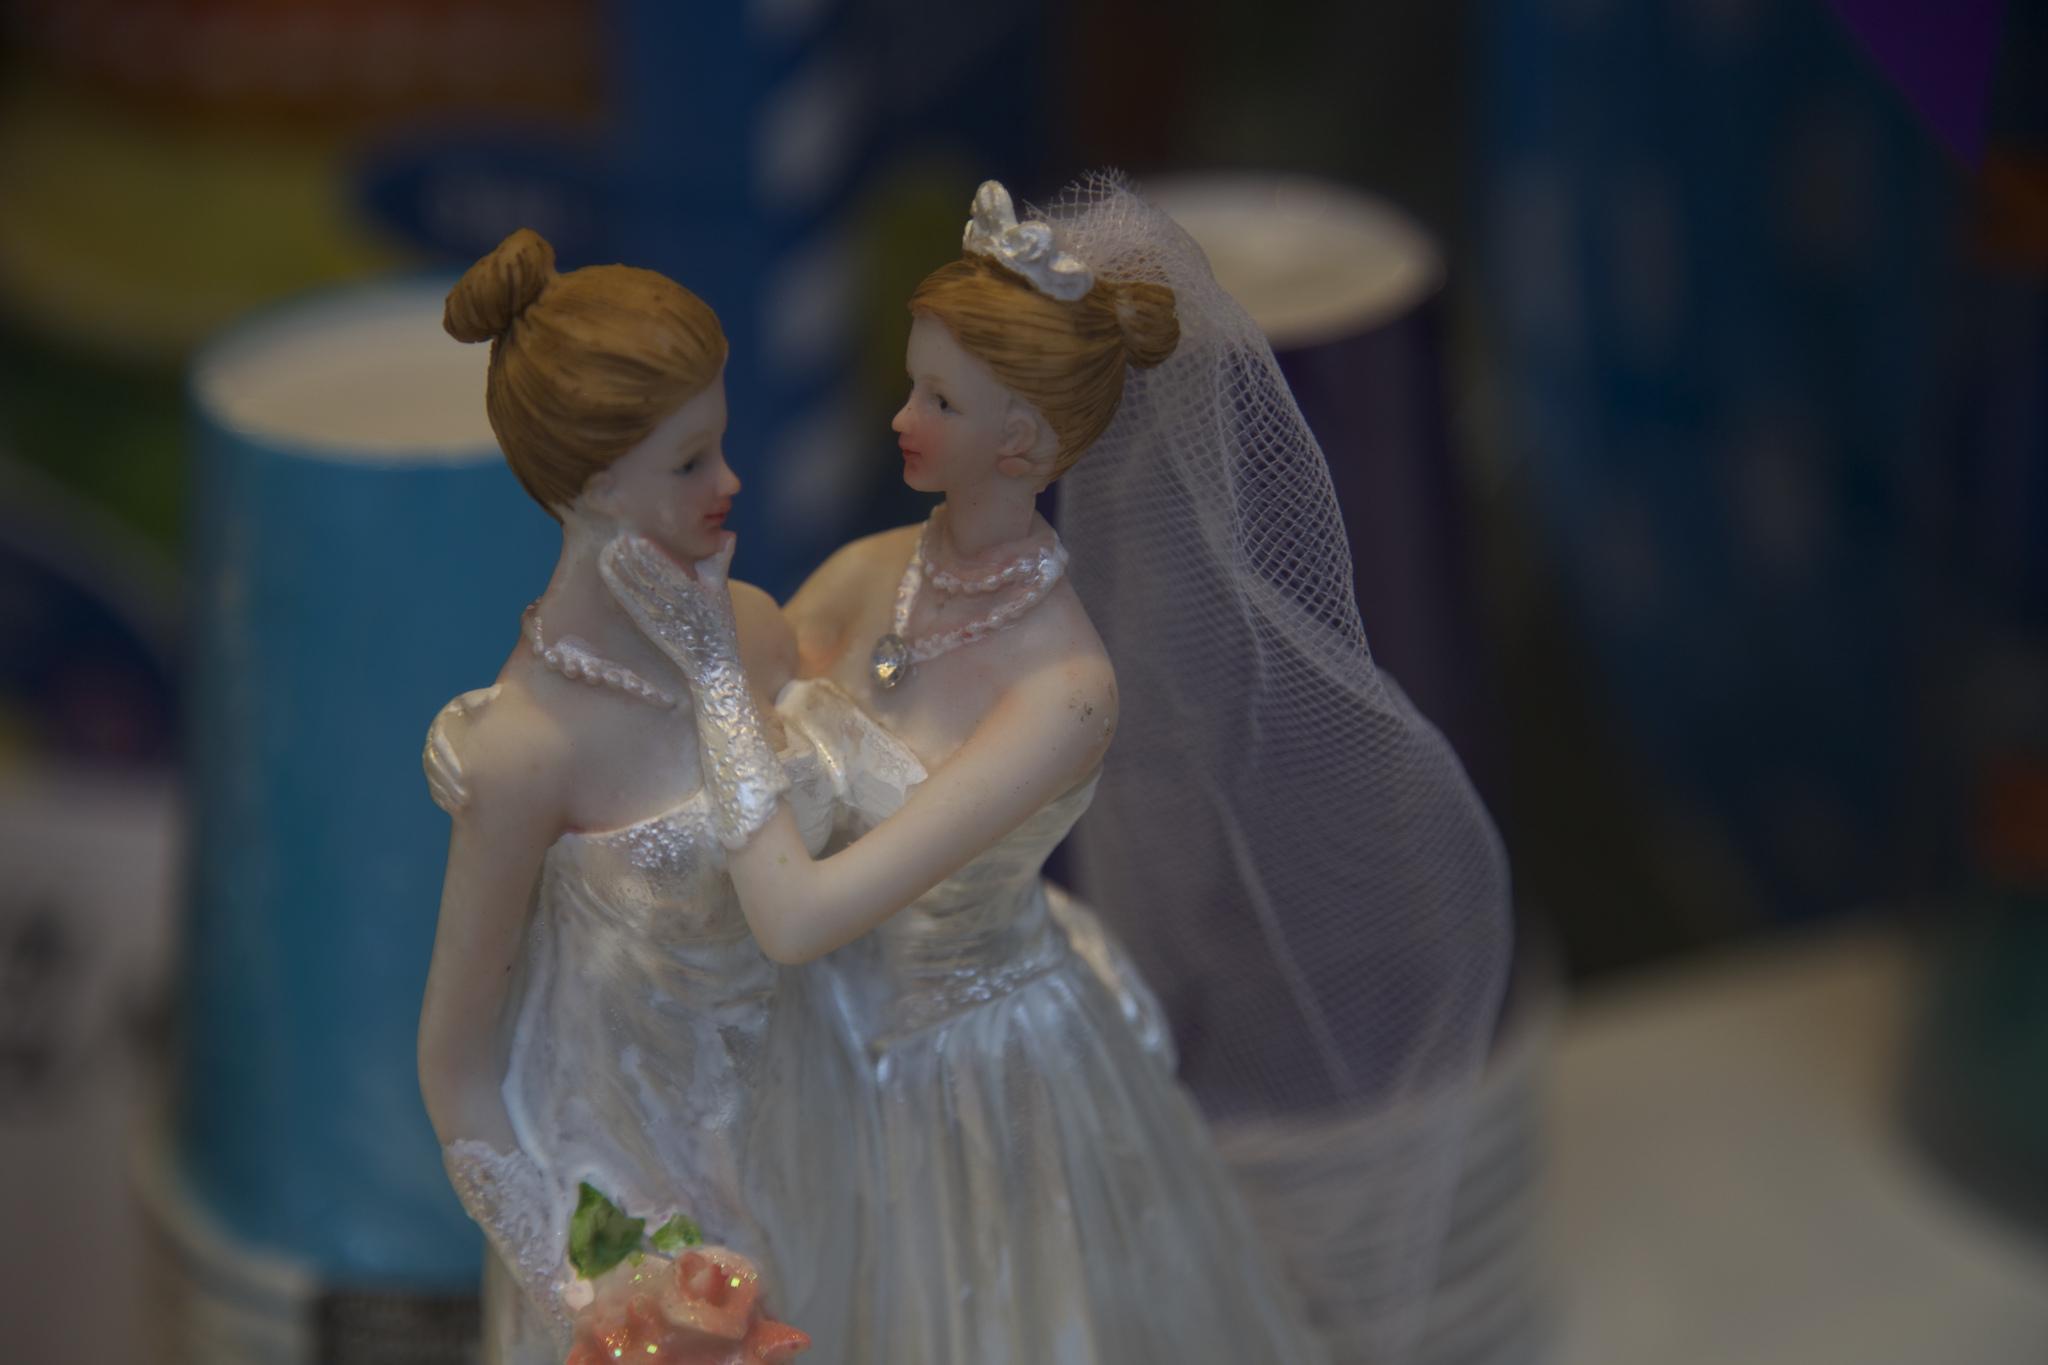 Wedding Cake Figures by Nuno Cardoso.